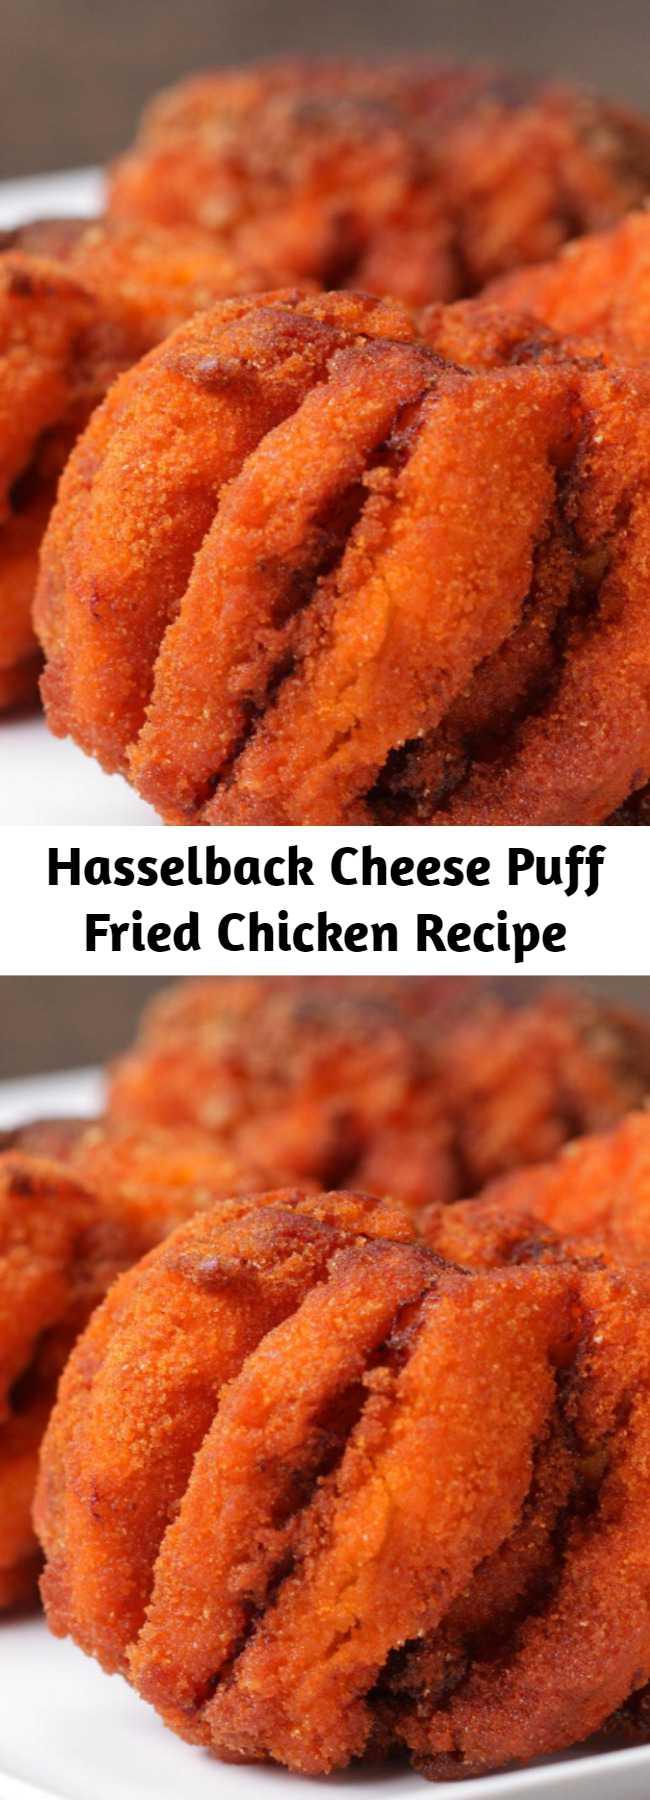 Hasselback Cheese Puff Fried Chicken Recipe